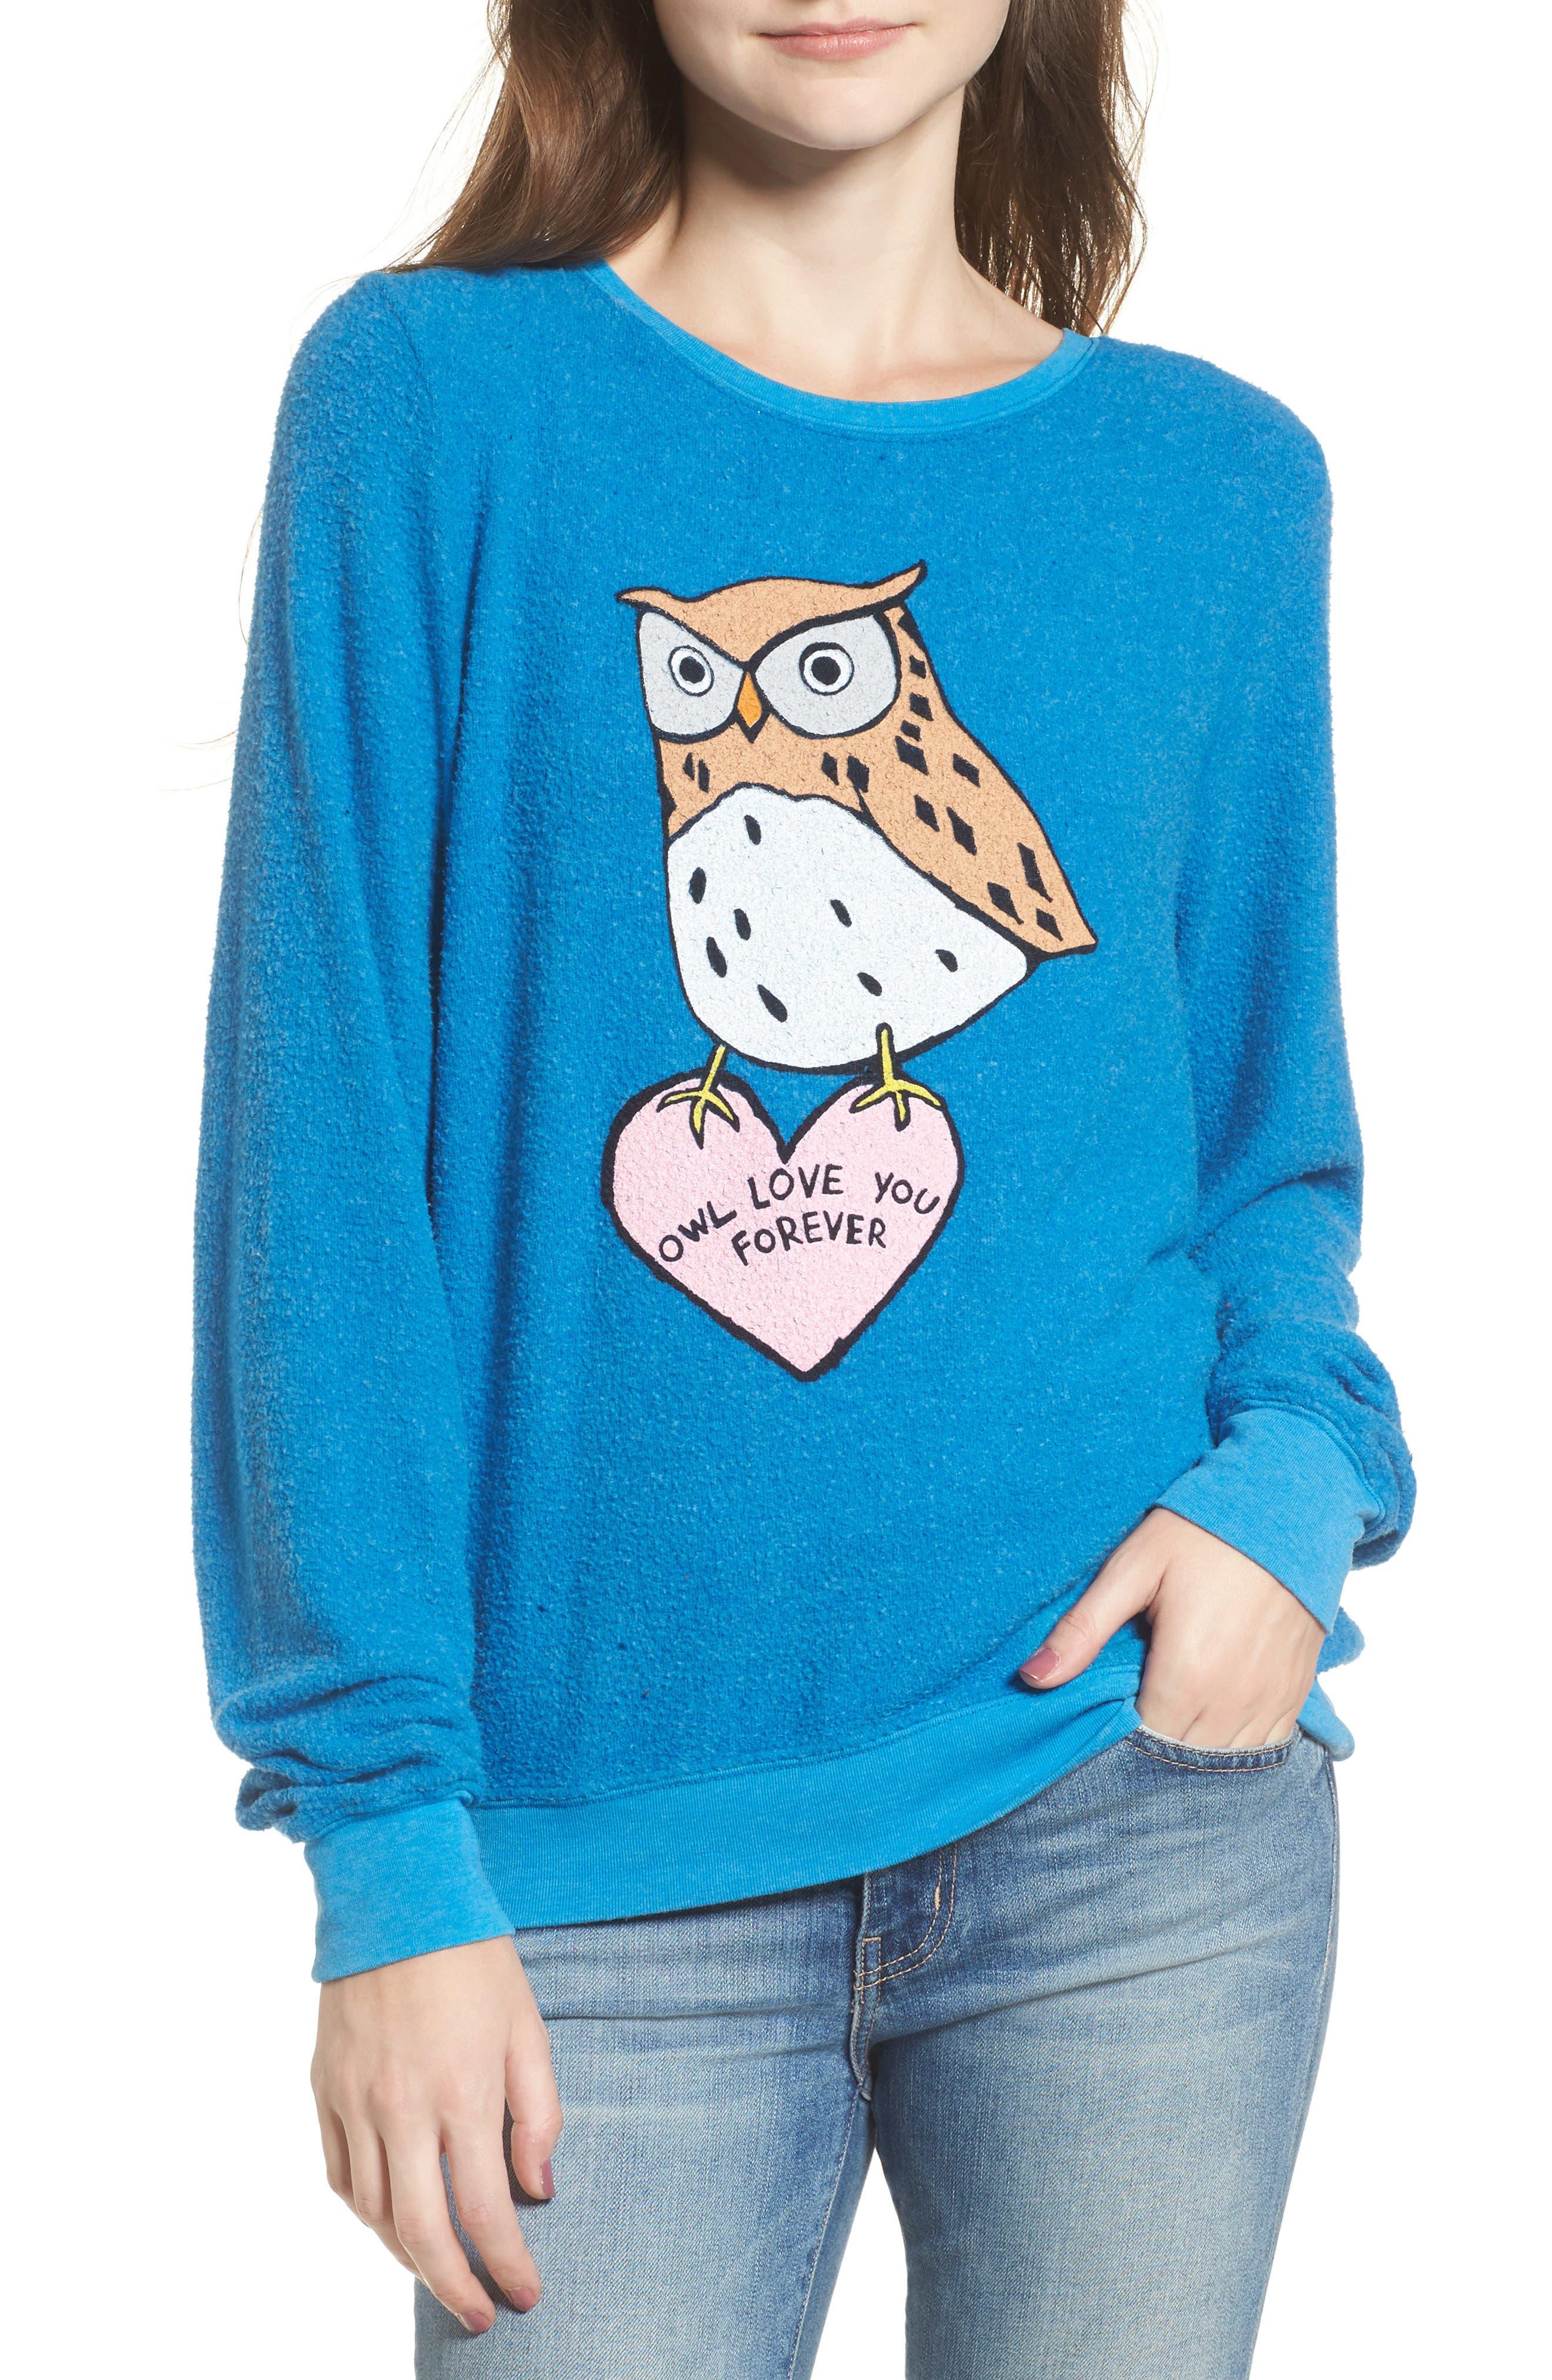 Main Image - Dream Scene Owl Love You Forever Sweatshirt